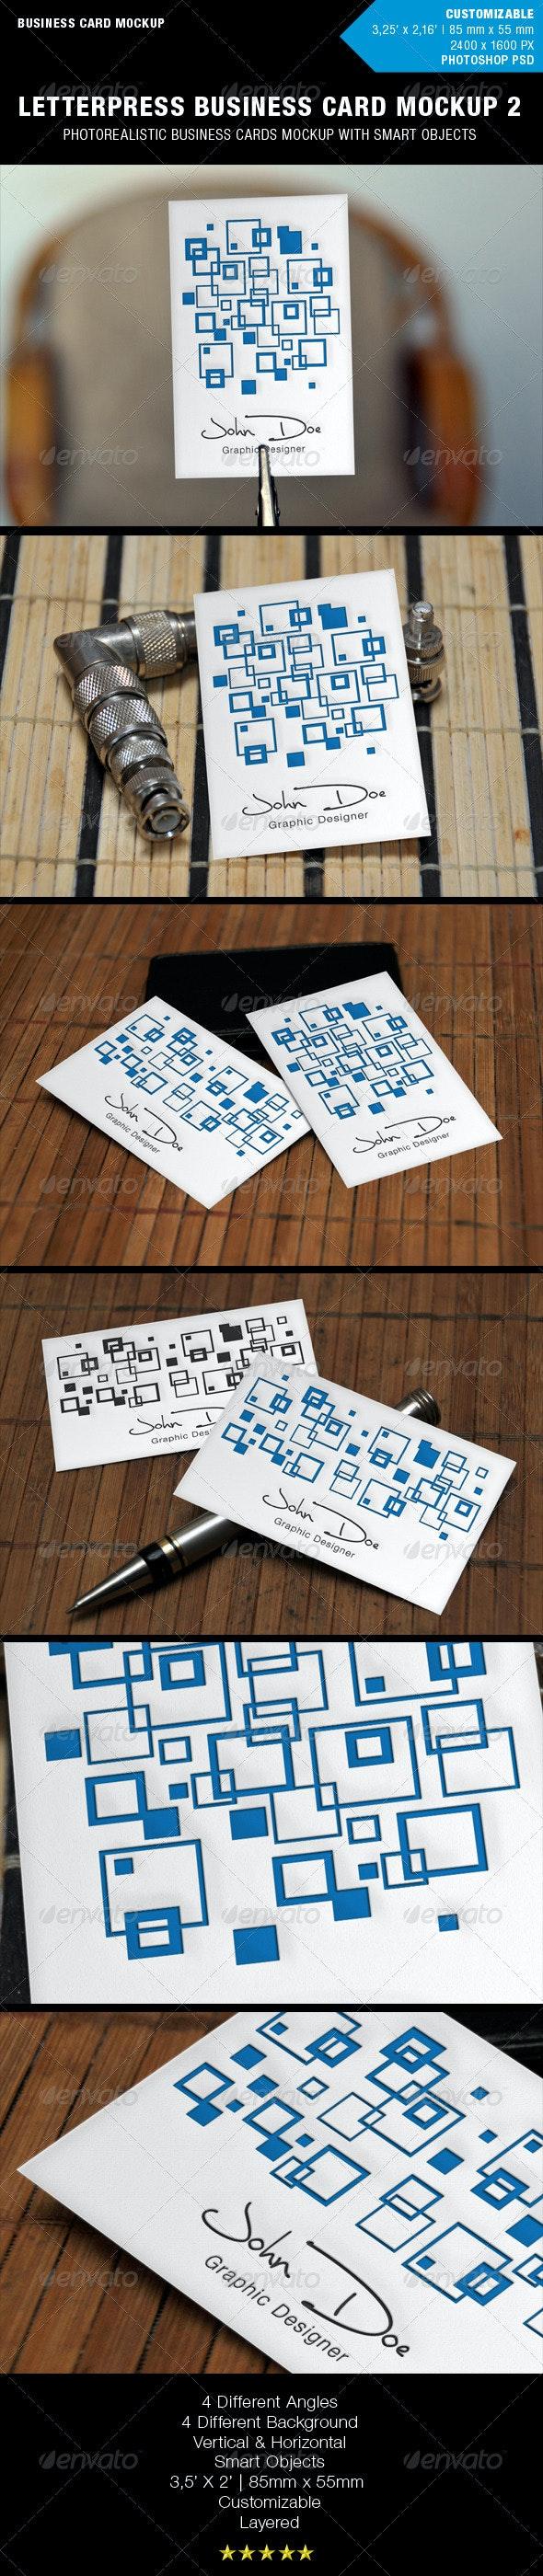 Letterpress Business Card Mockup 2 - Business Cards Print